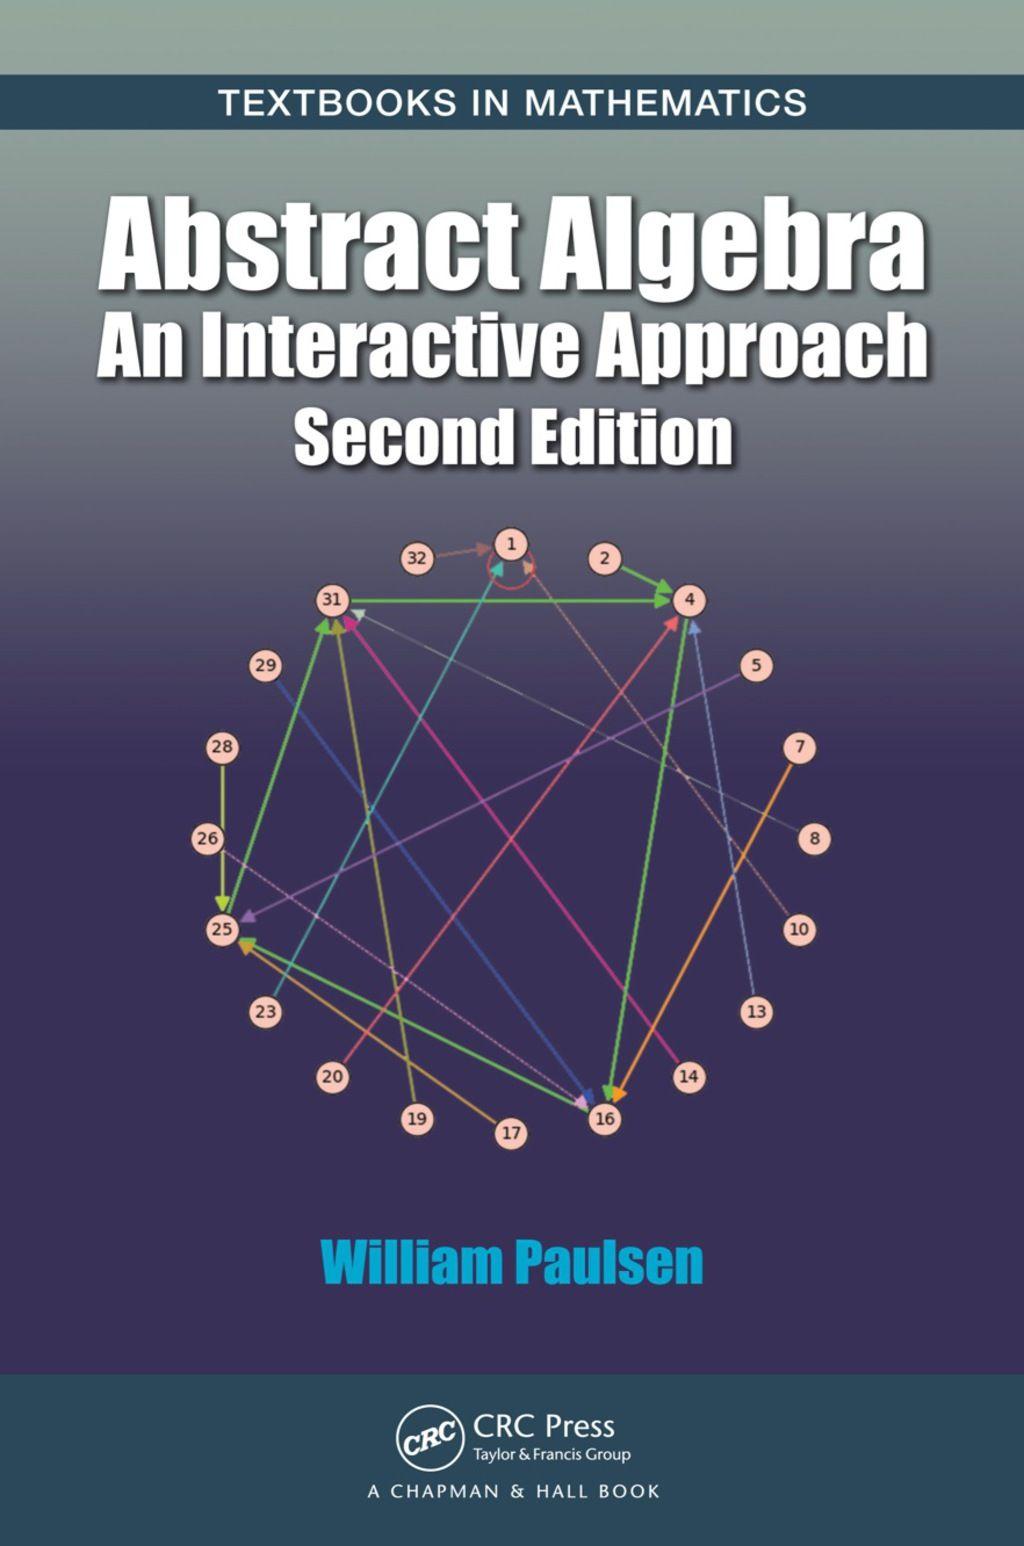 Abstract Algebra Ebook Rental